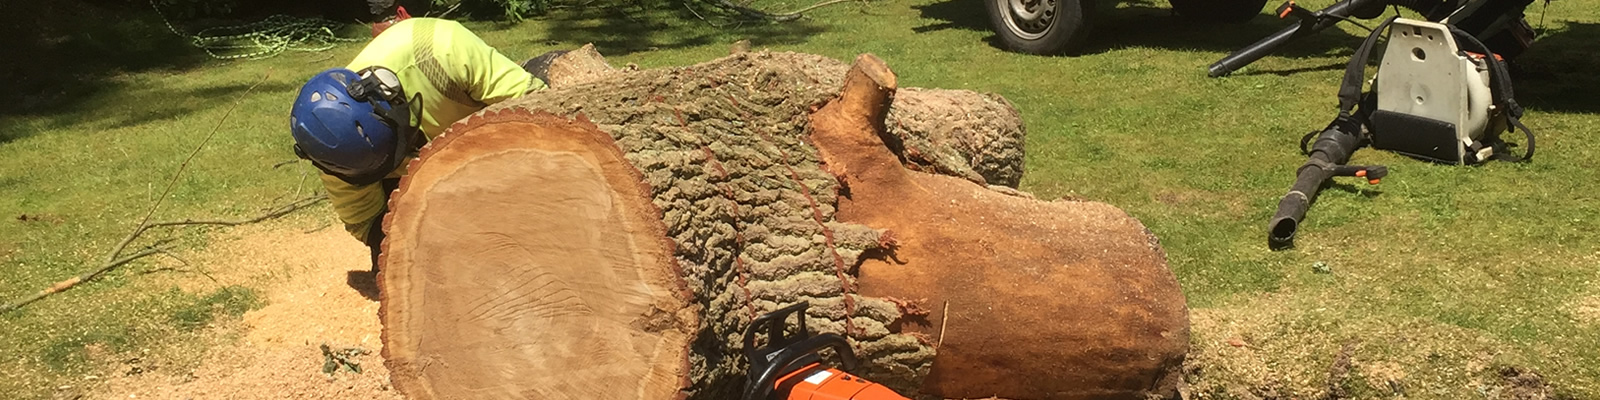 Head4heights Tree Surgery